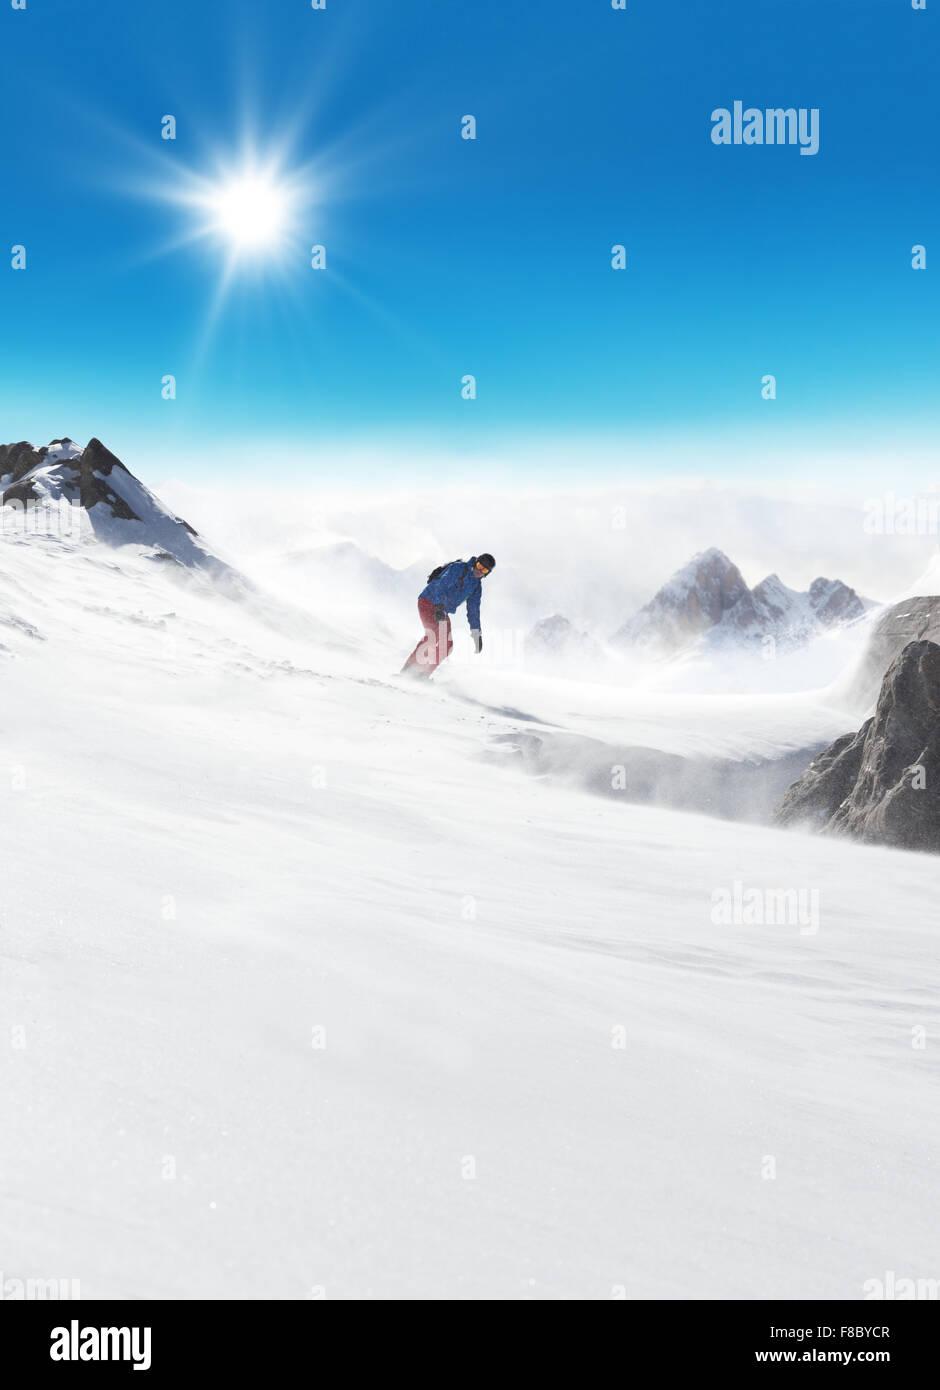 Snowboarder running down on piste - Stock Image